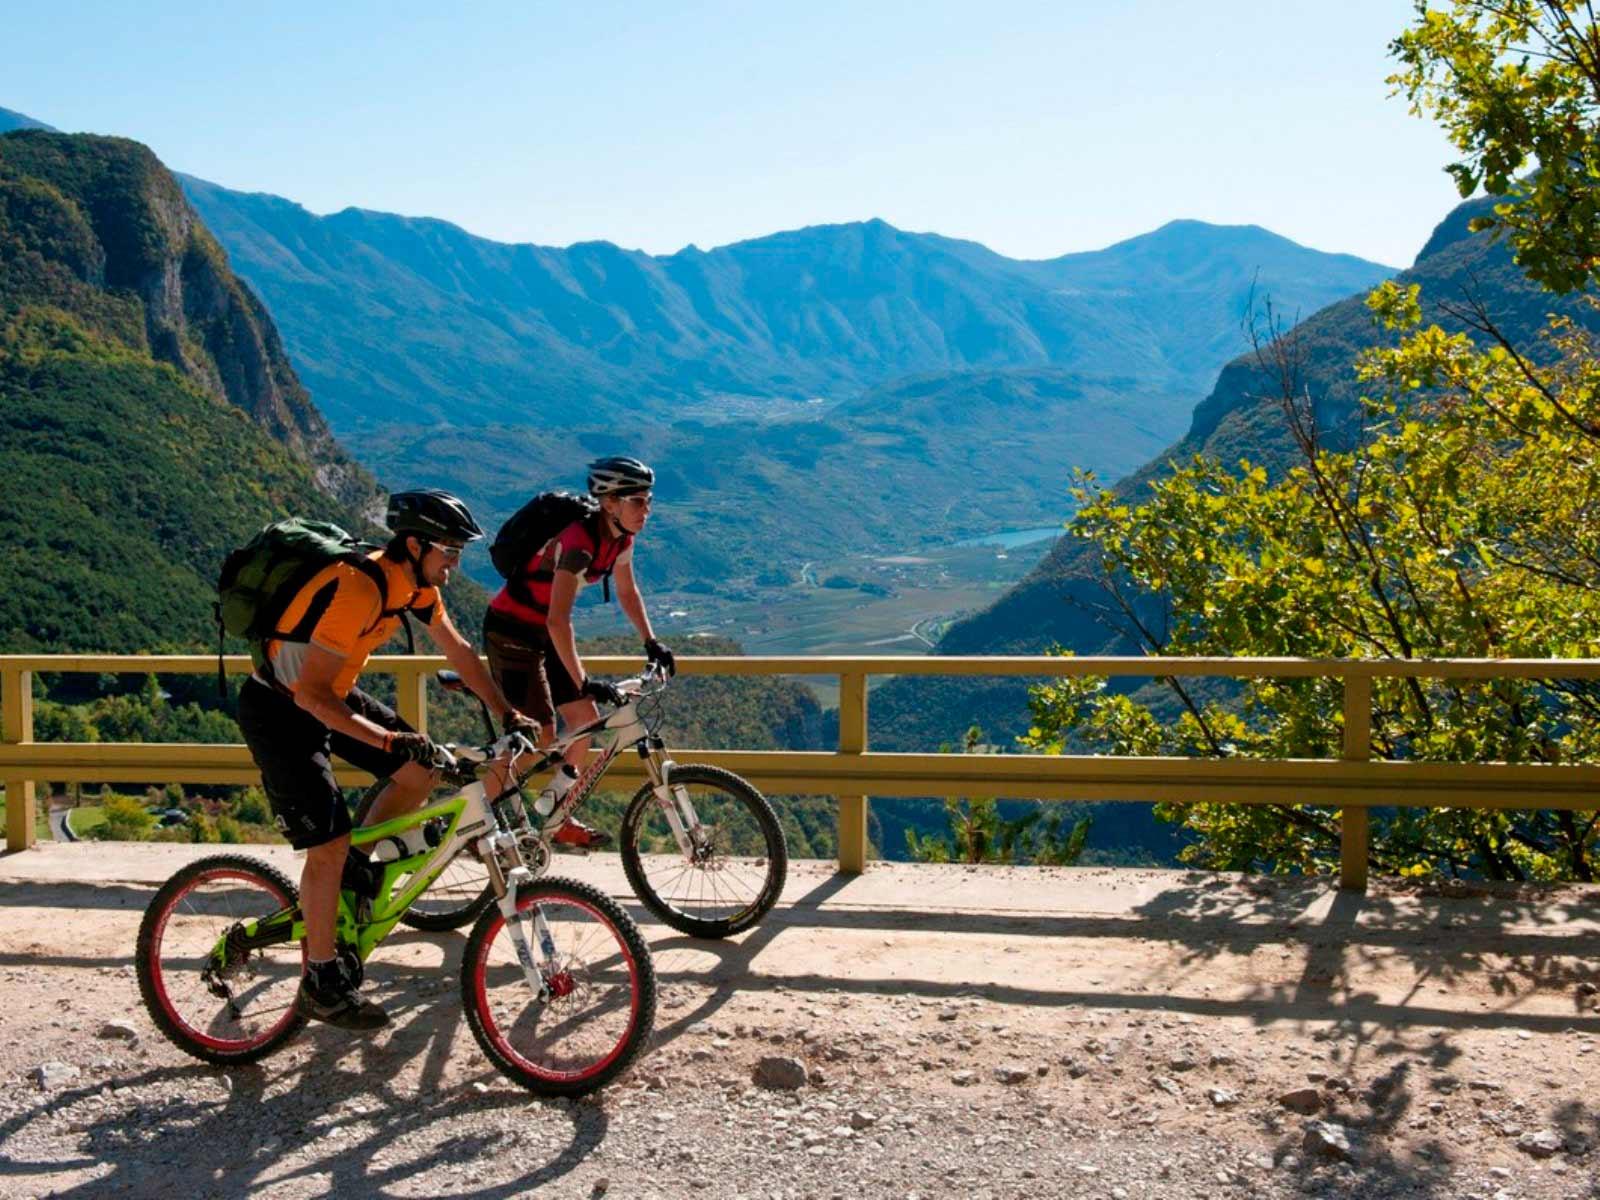 Offerta: Vacanze in Mountain Bike, dalle Alpi al Lago di Garda